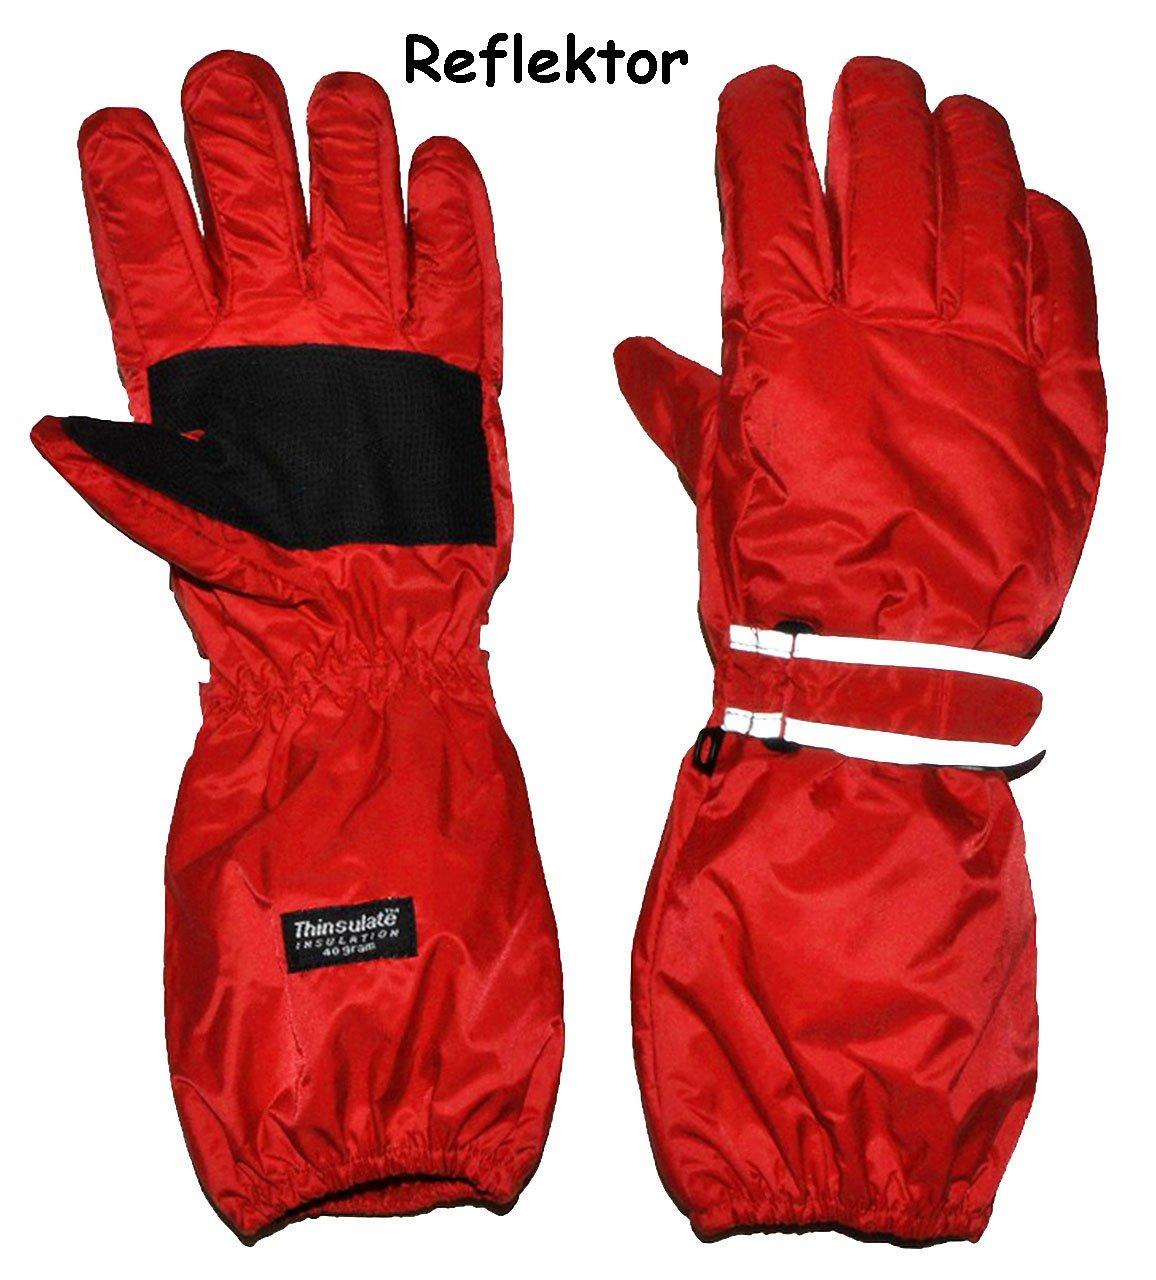 Thermohandschuhe / Fingerhandschuhe - mit langem Schaft -